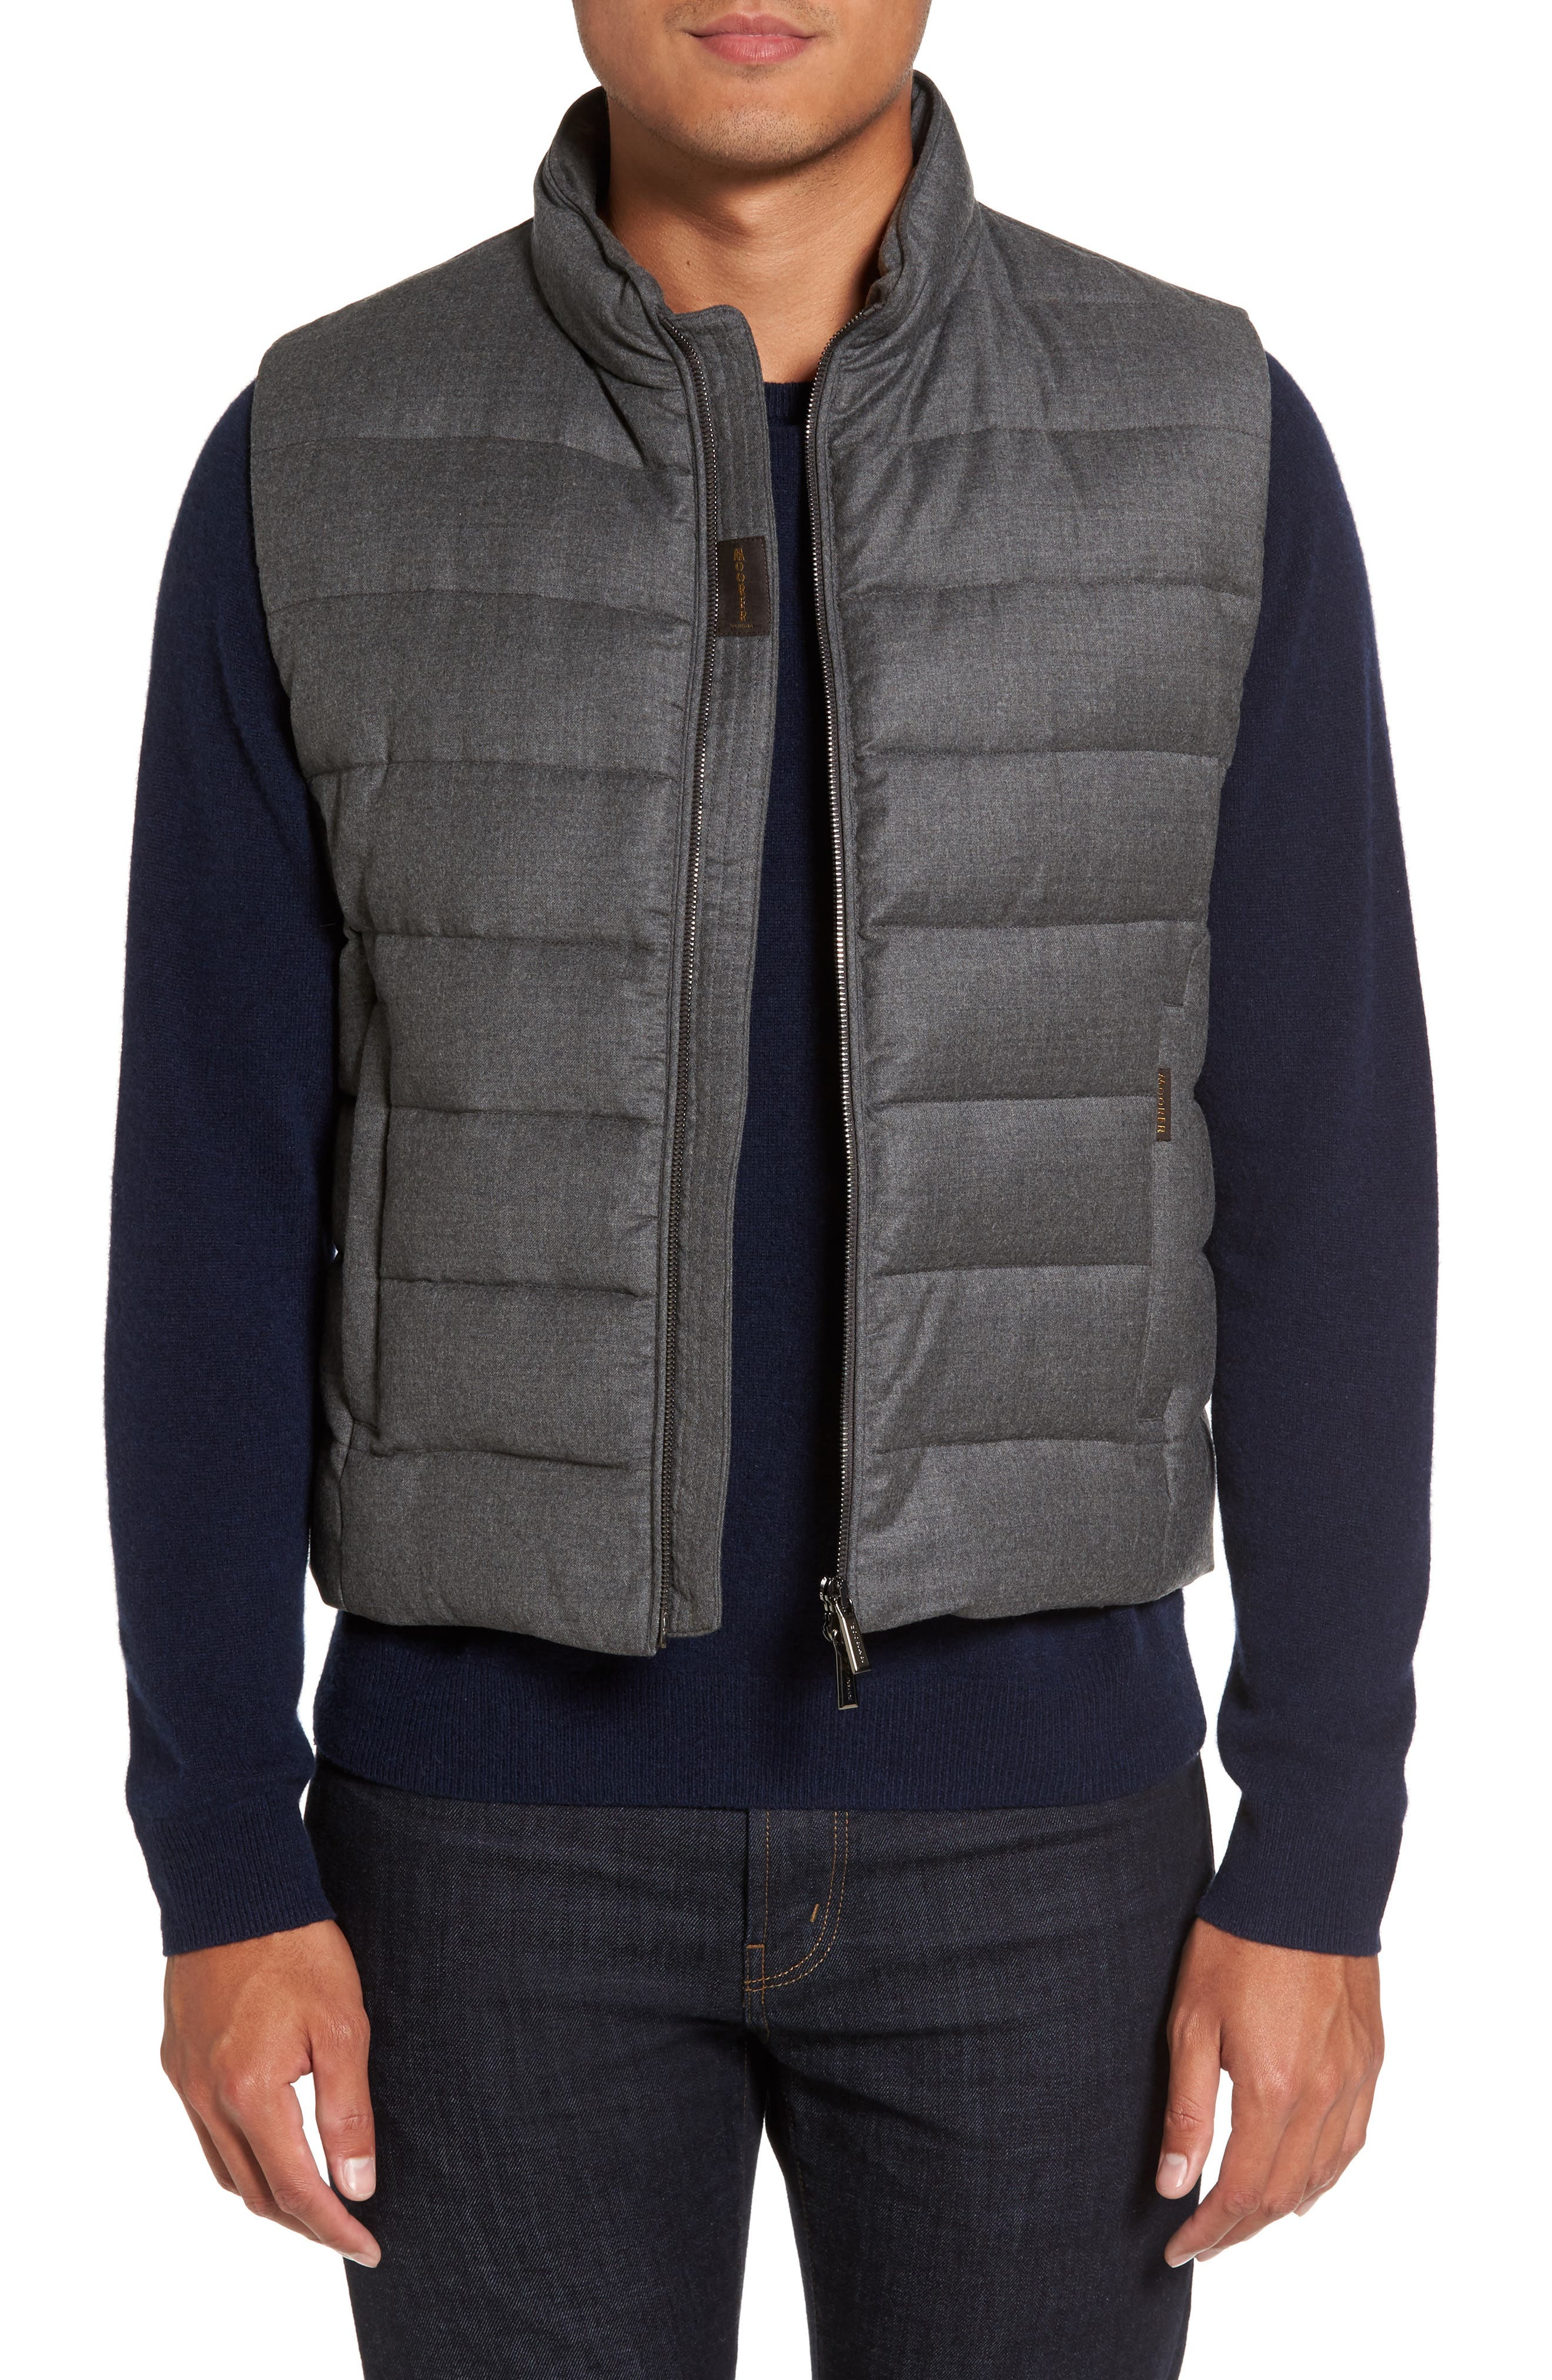 Oliver L Wool & Cashmere Flannel Waterproof Vest,                             Main thumbnail 1, color,                             030